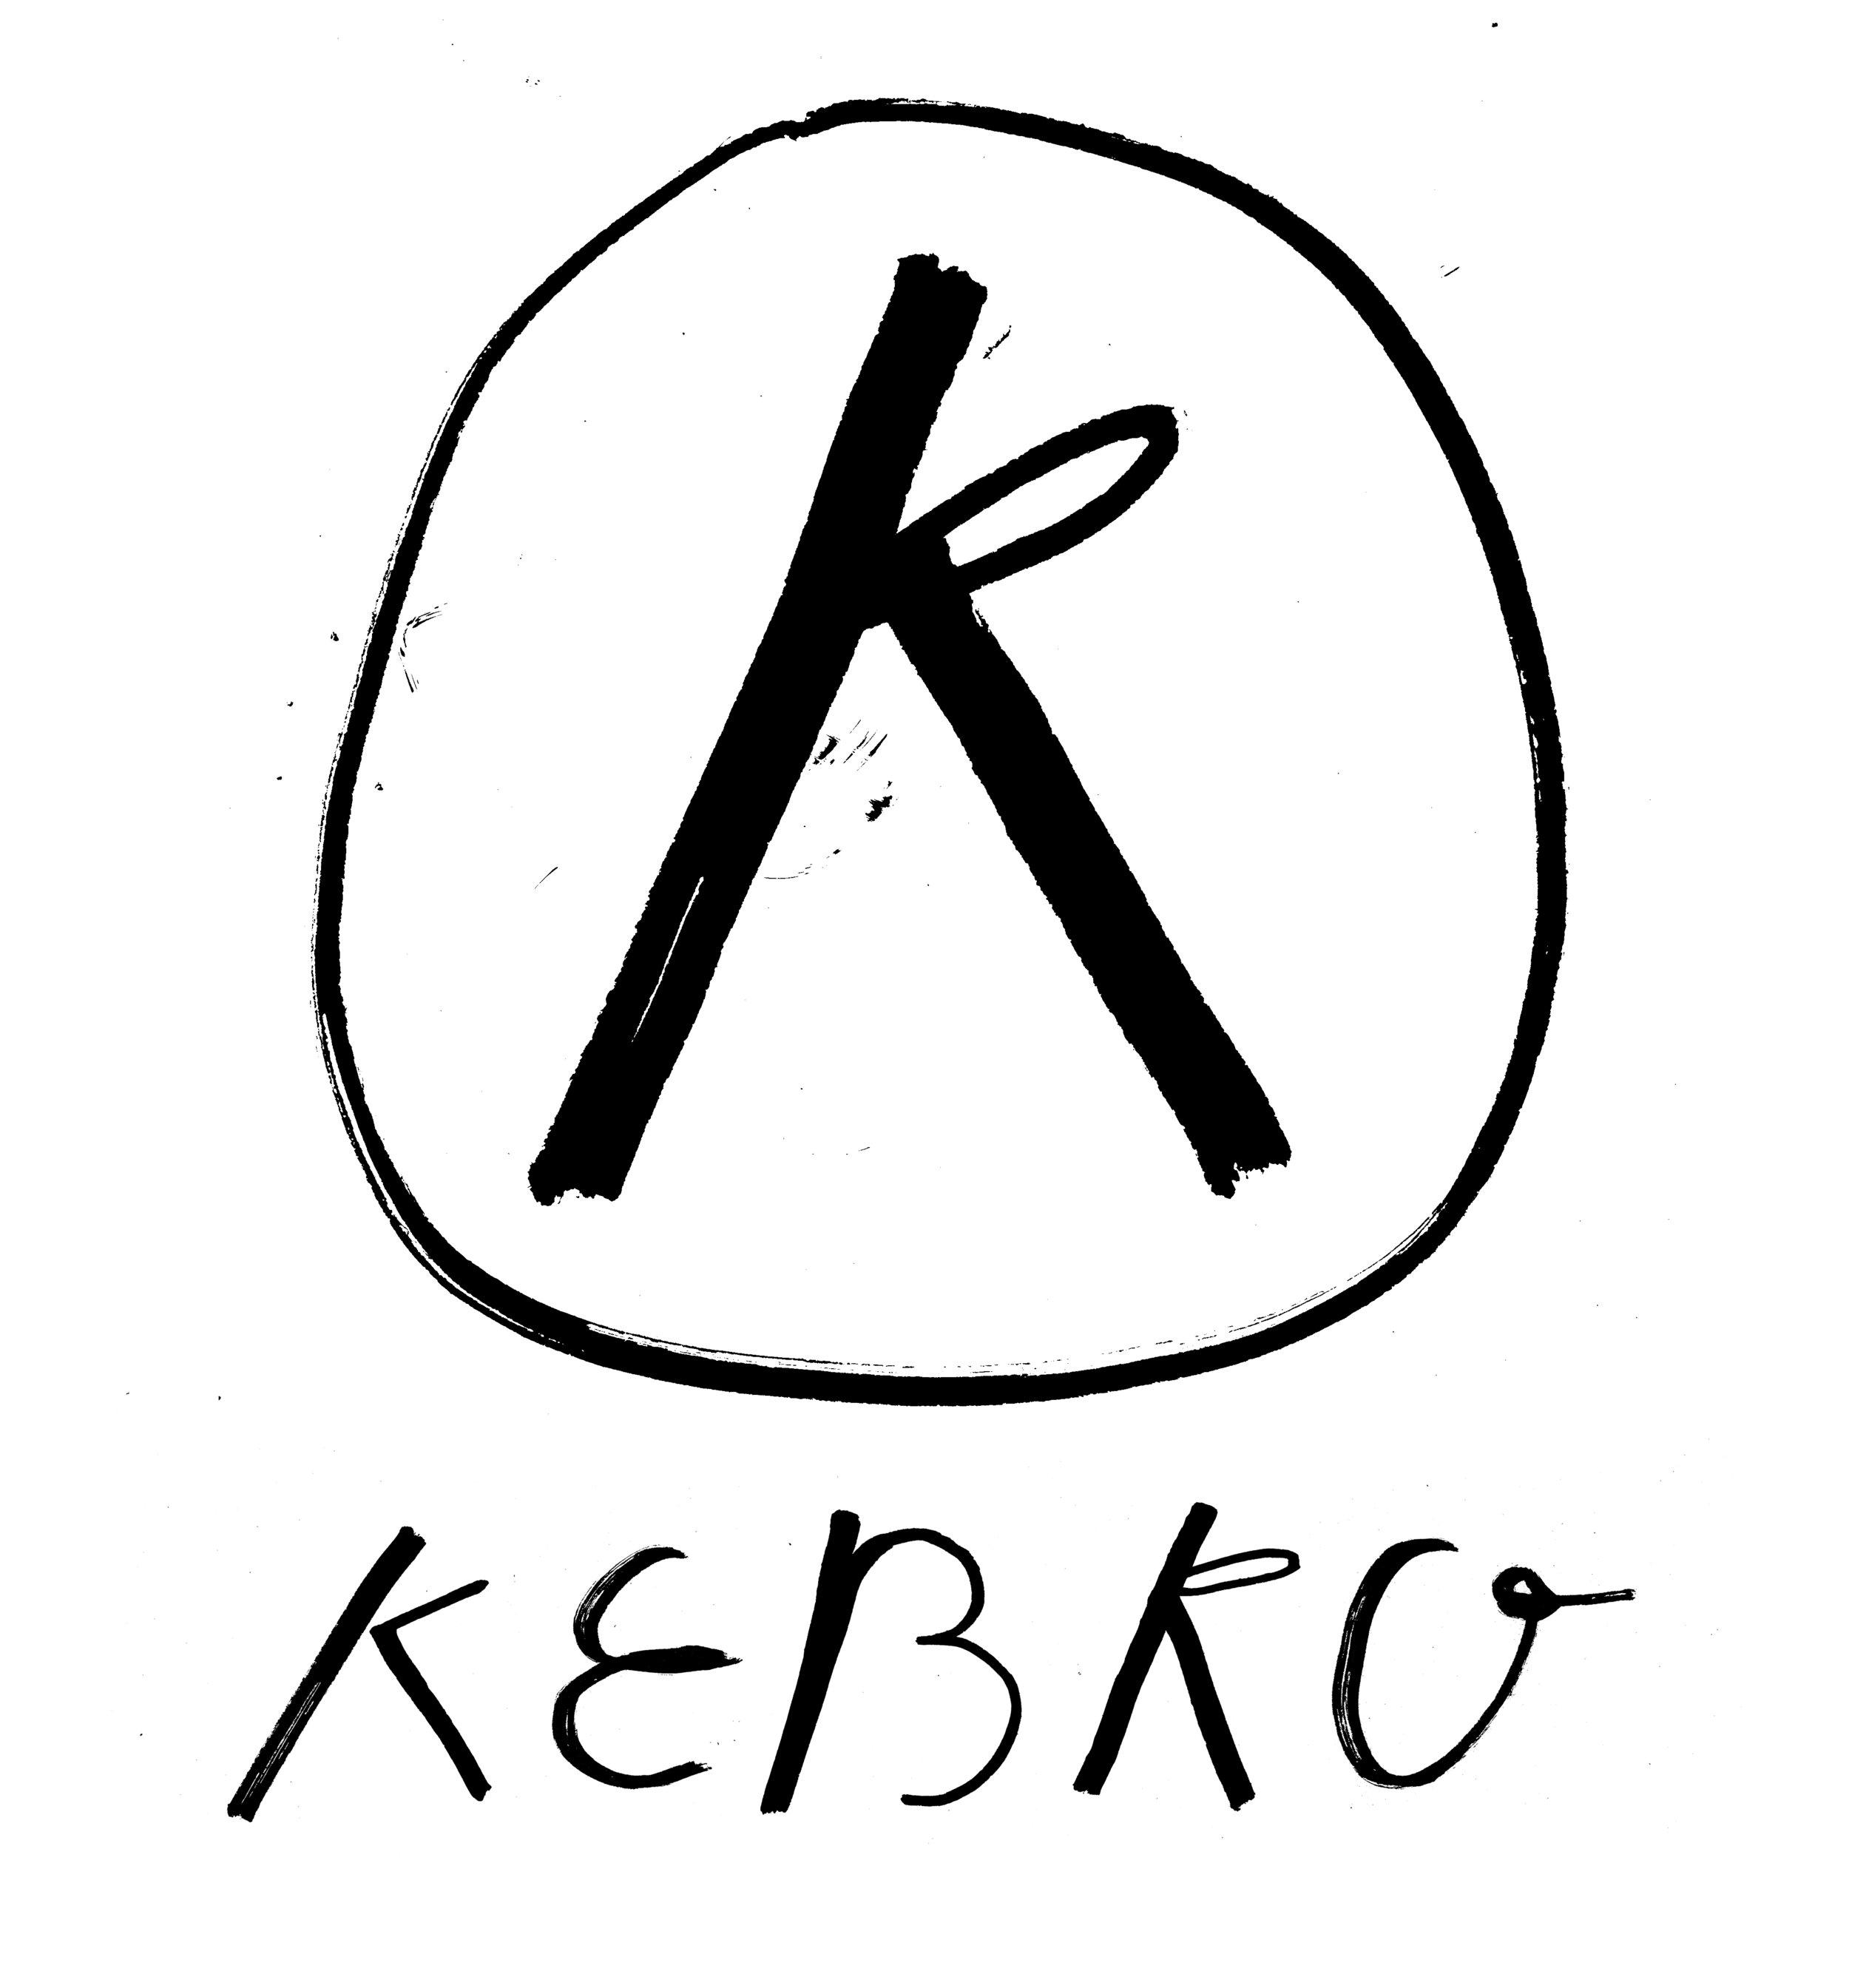 Kebko_K_types_Texture_BIG.jpg